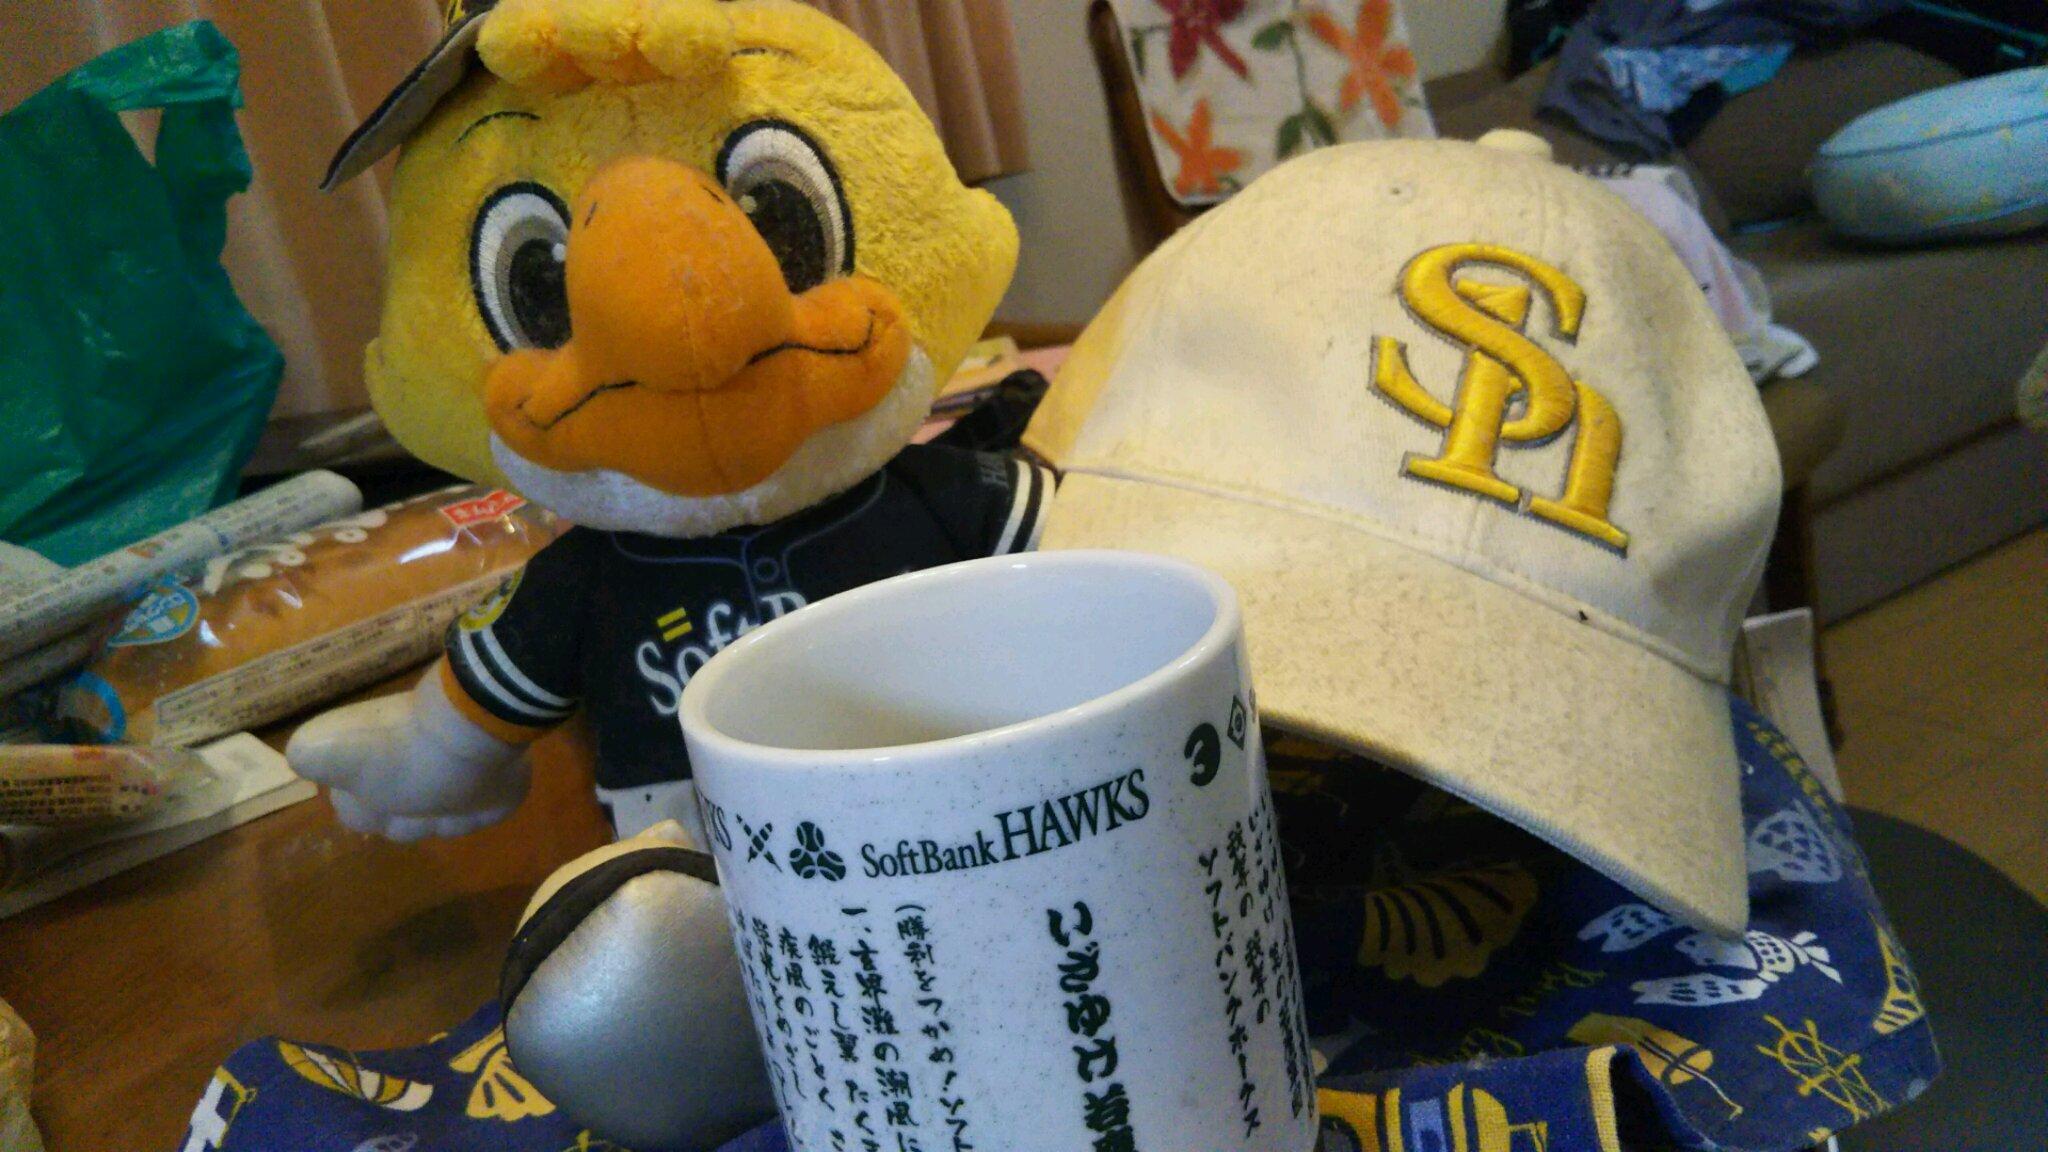 DSC_0147 ホークスグッズ写真。茶碗。帽子。人形